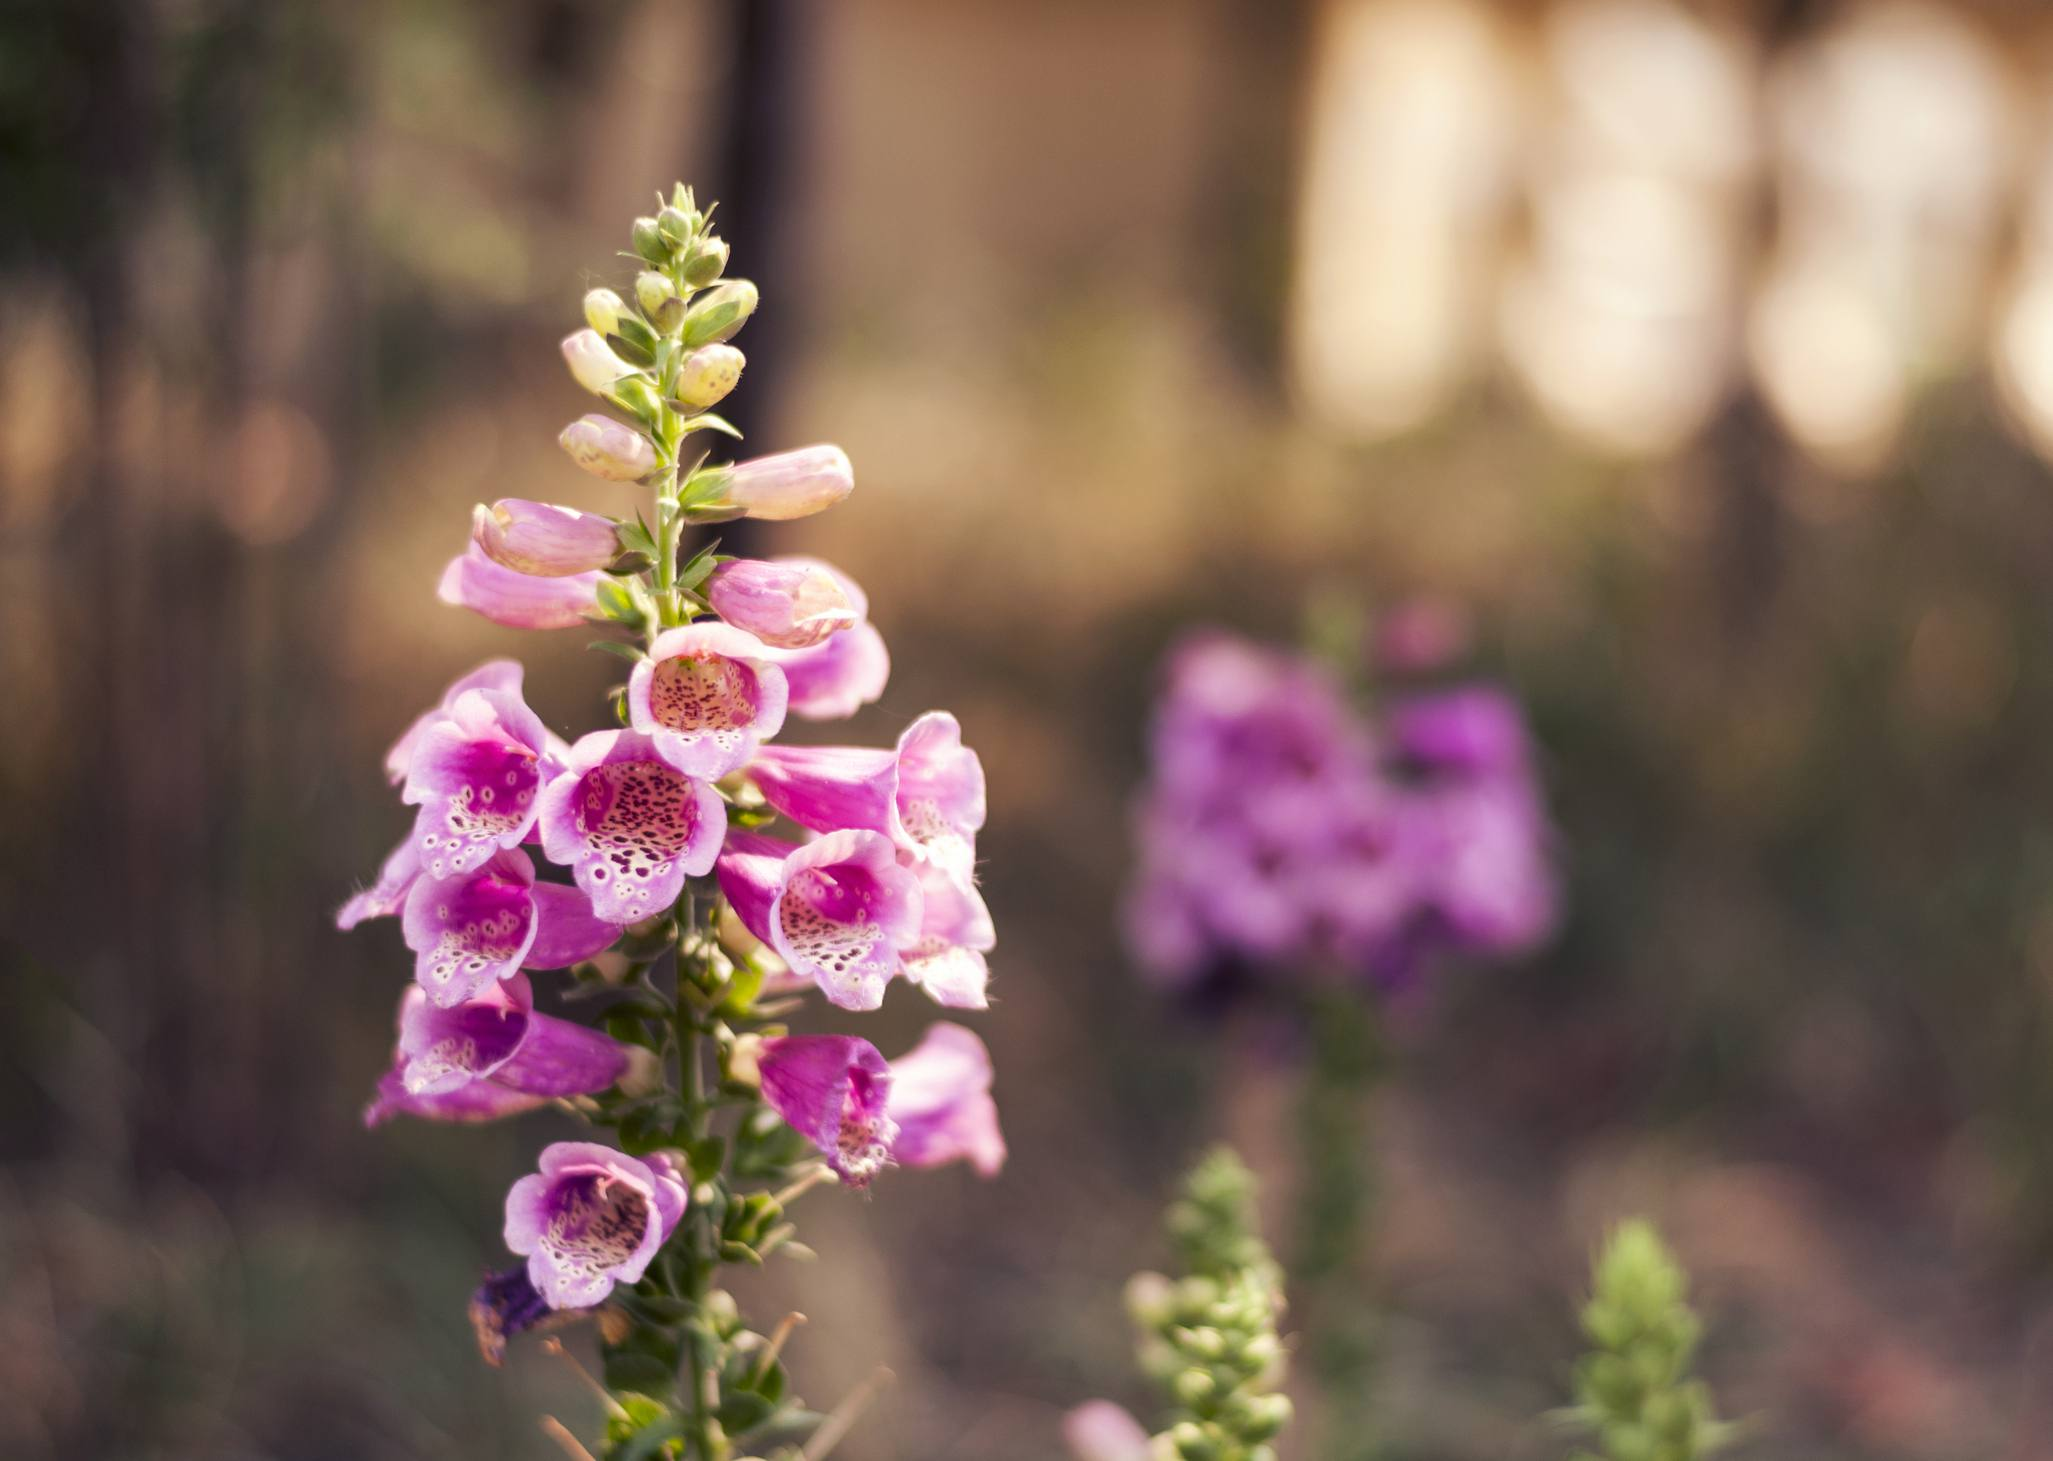 Purple Digitalis purpurea (foxglove) blooming.